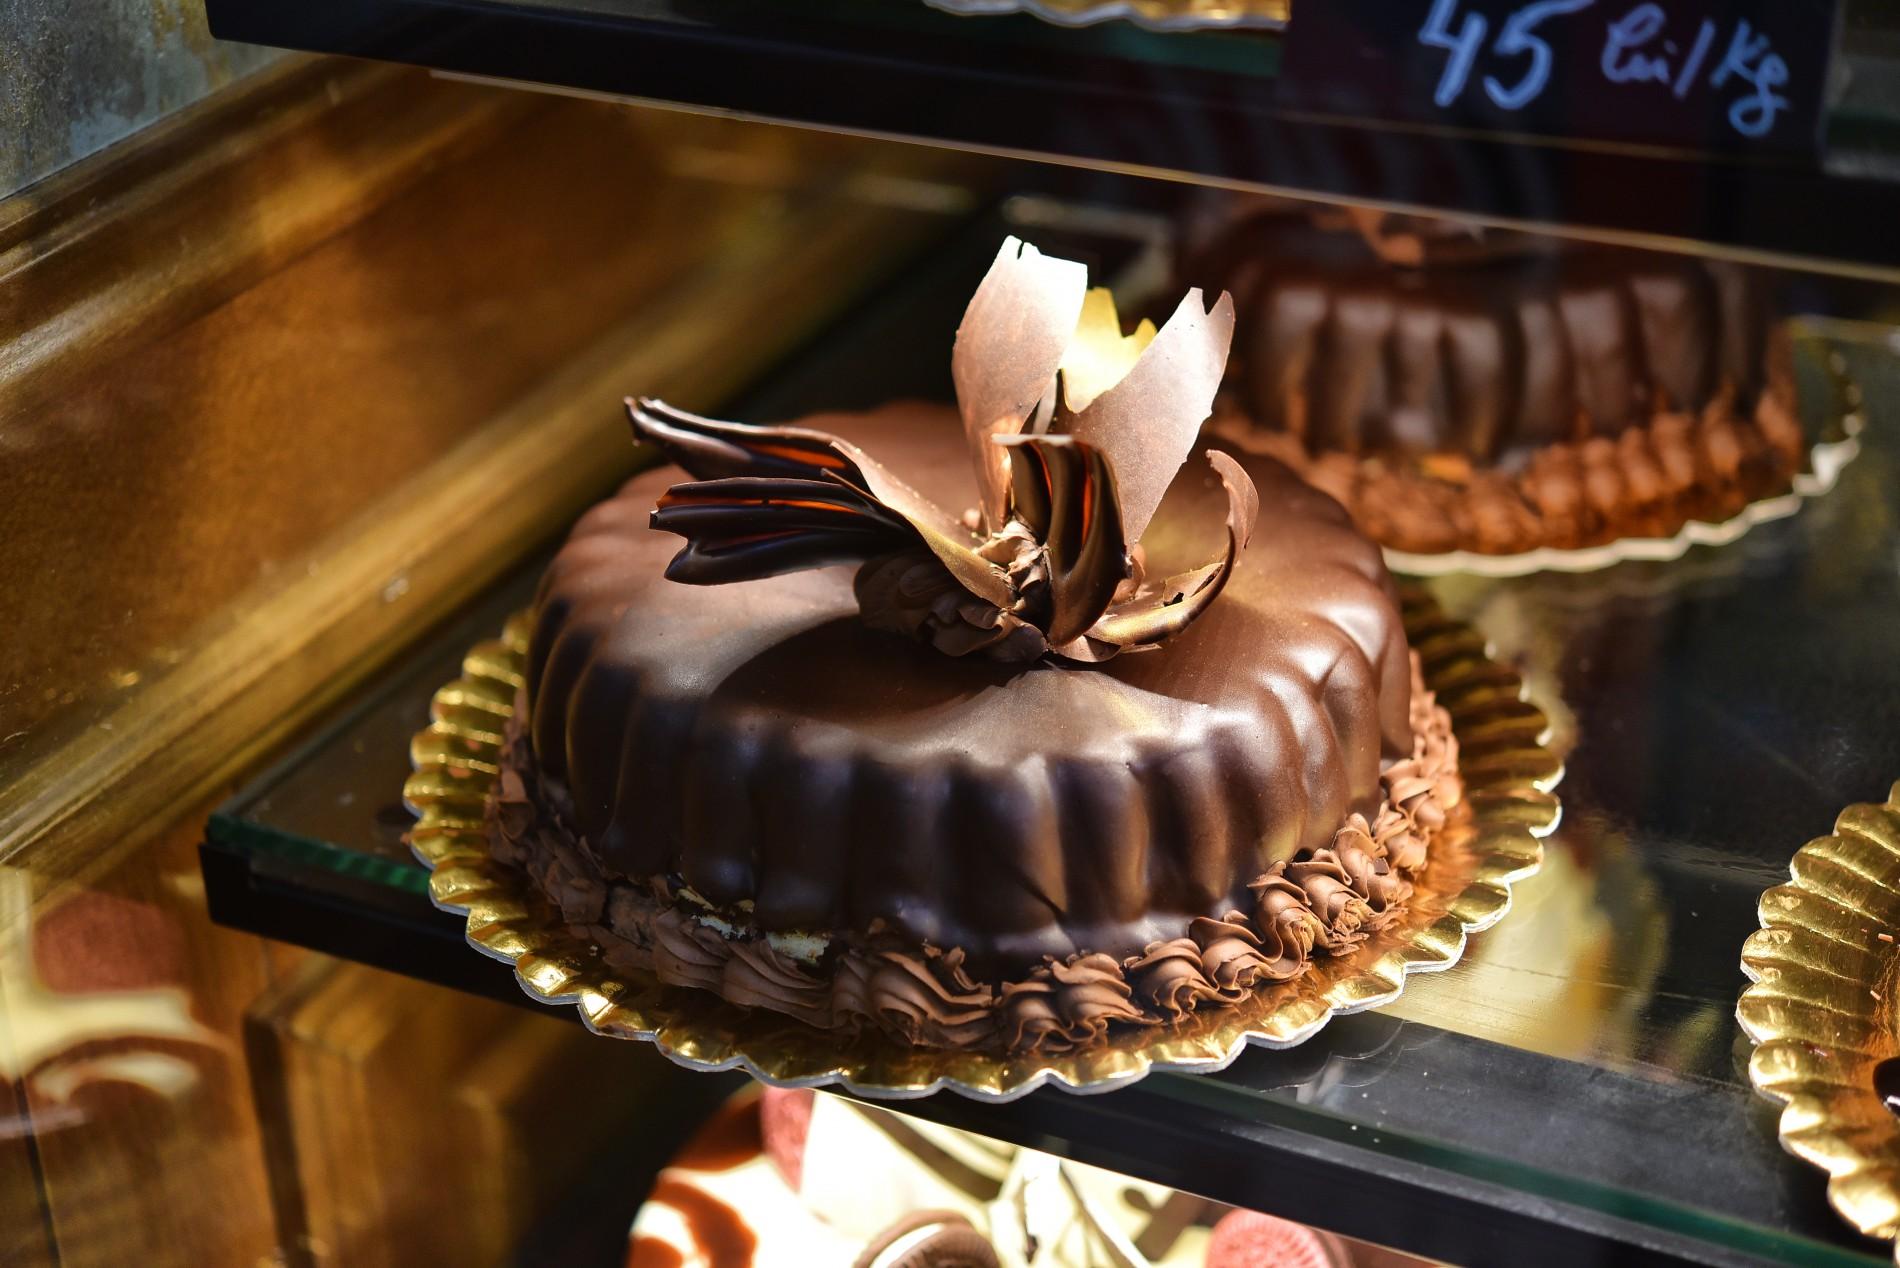 Tort Jofre